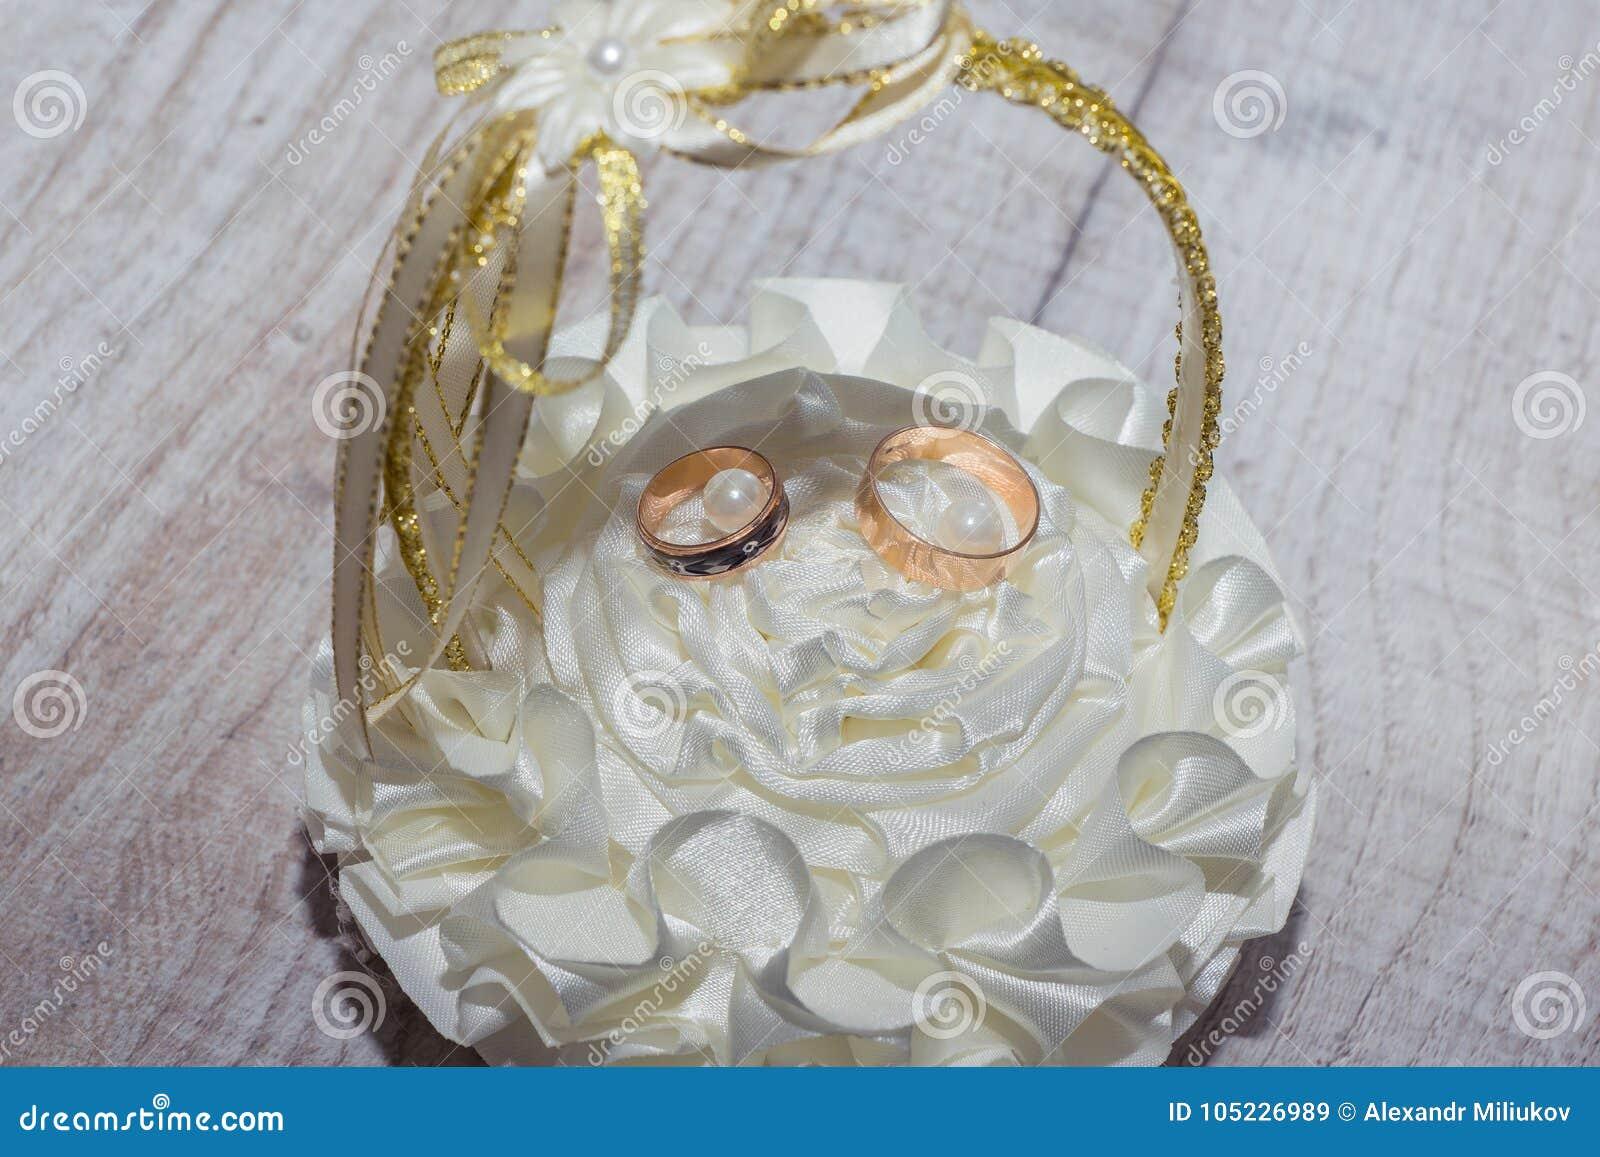 Wedding rings in a beautiful basket